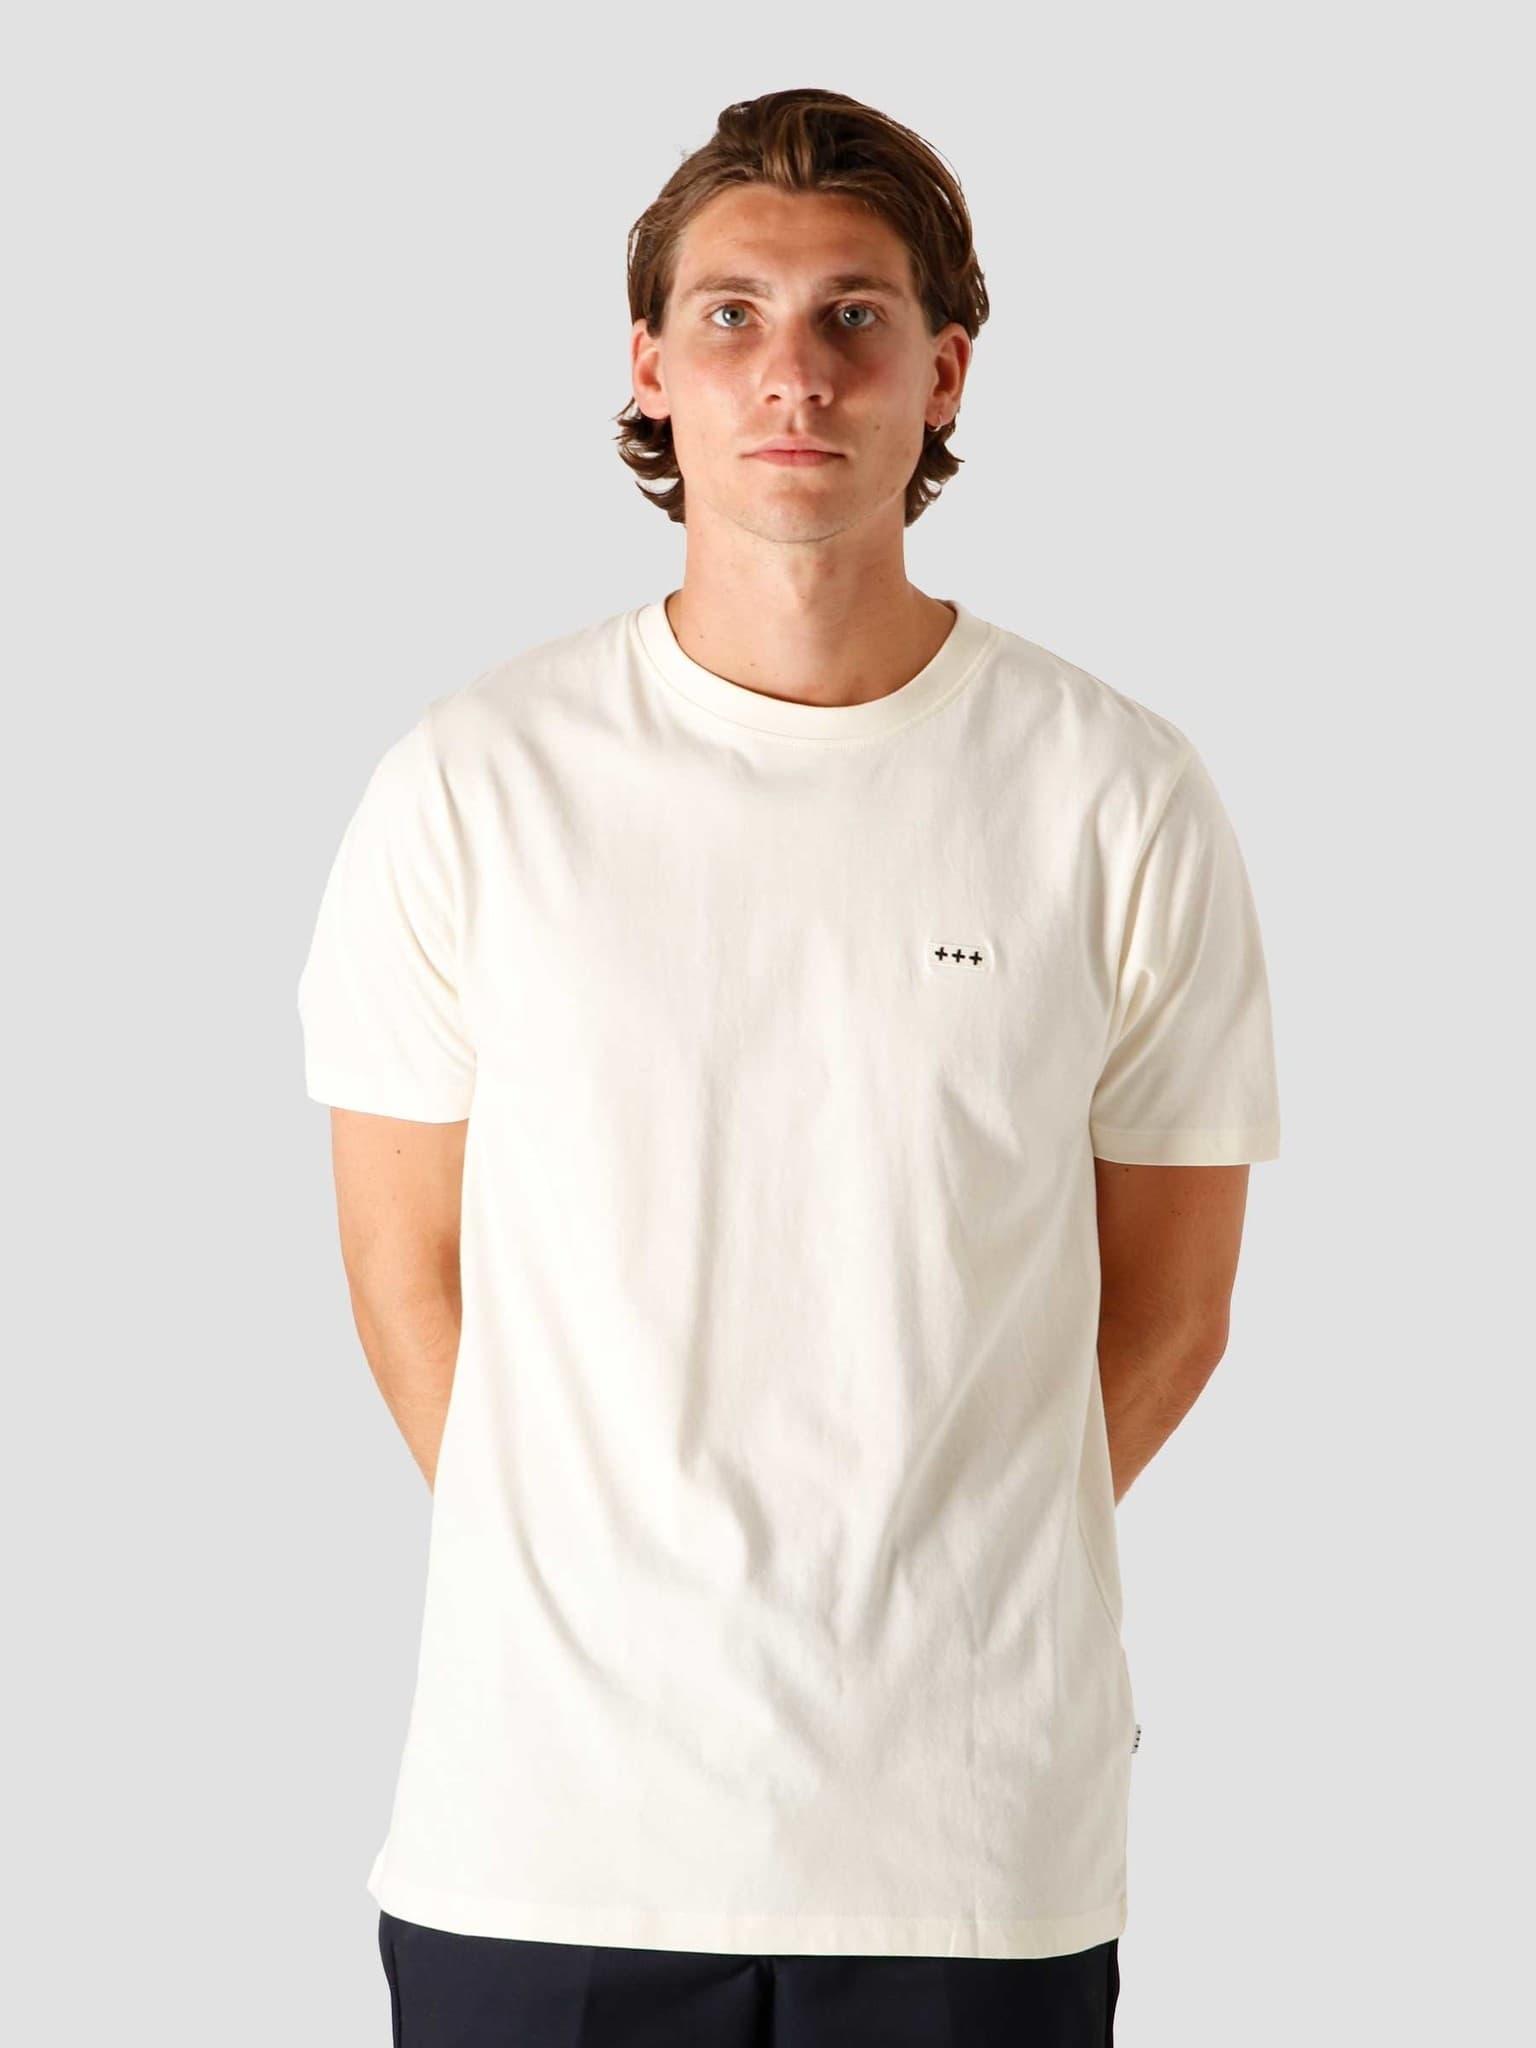 QB03 Patch Logo T-shirt Off White